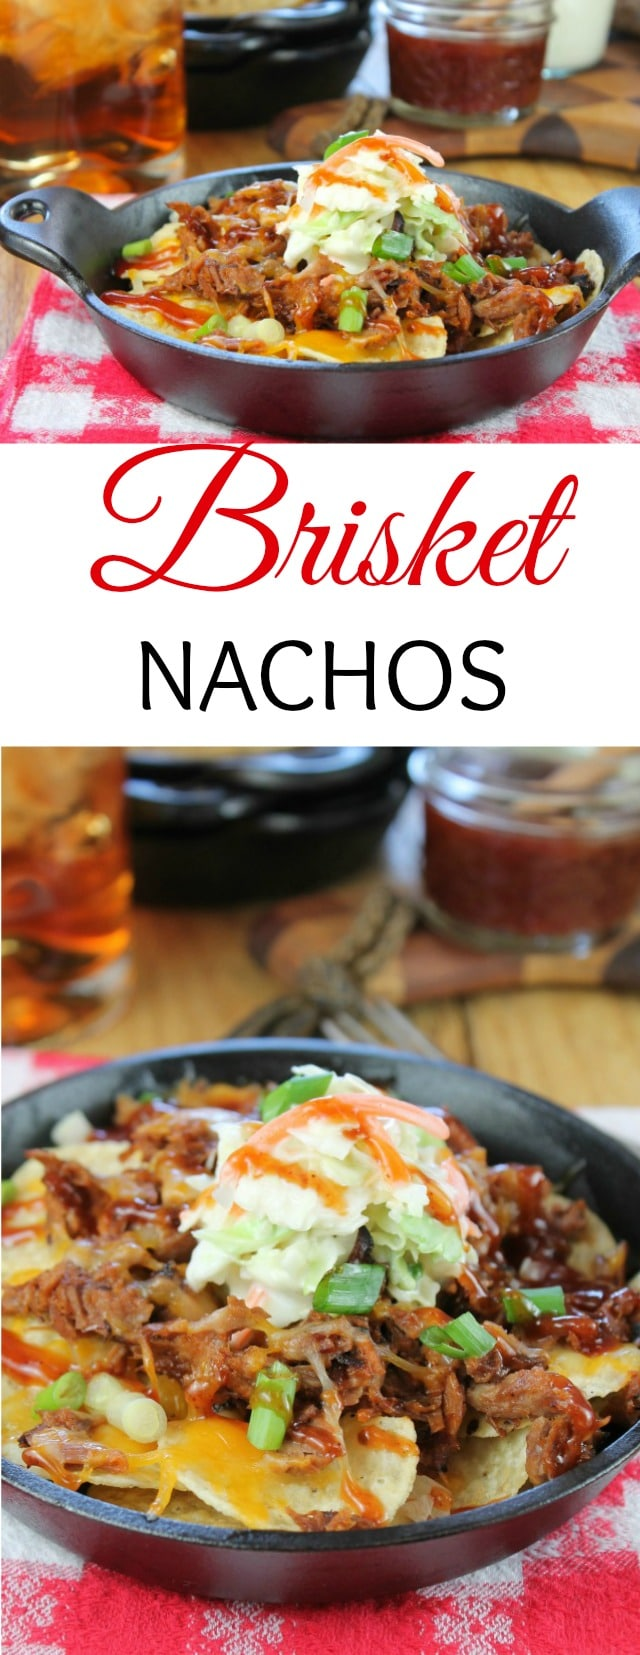 Brisket Nachos Recipe with barbecue sauce